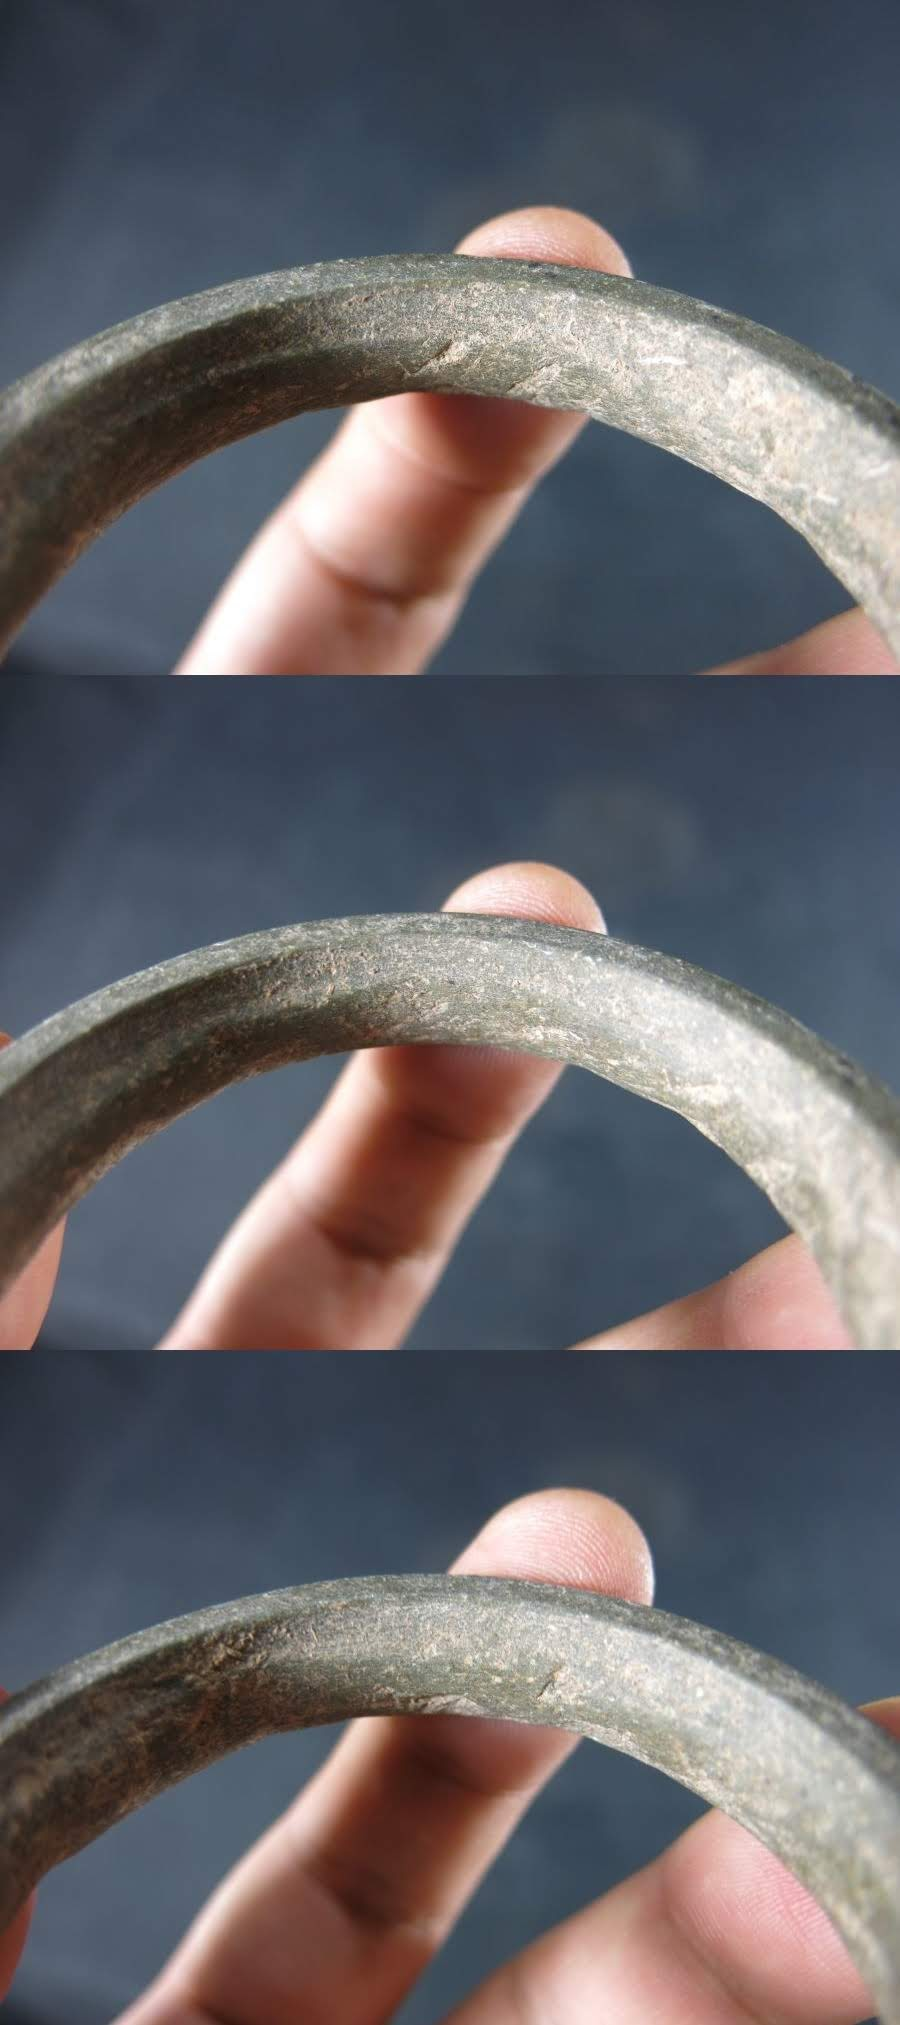 A タイ バンチェン石製腕輪① 紀元前1000年 遺跡発掘品 文化財 珍品 ユネスコの世界遺産 古代文明